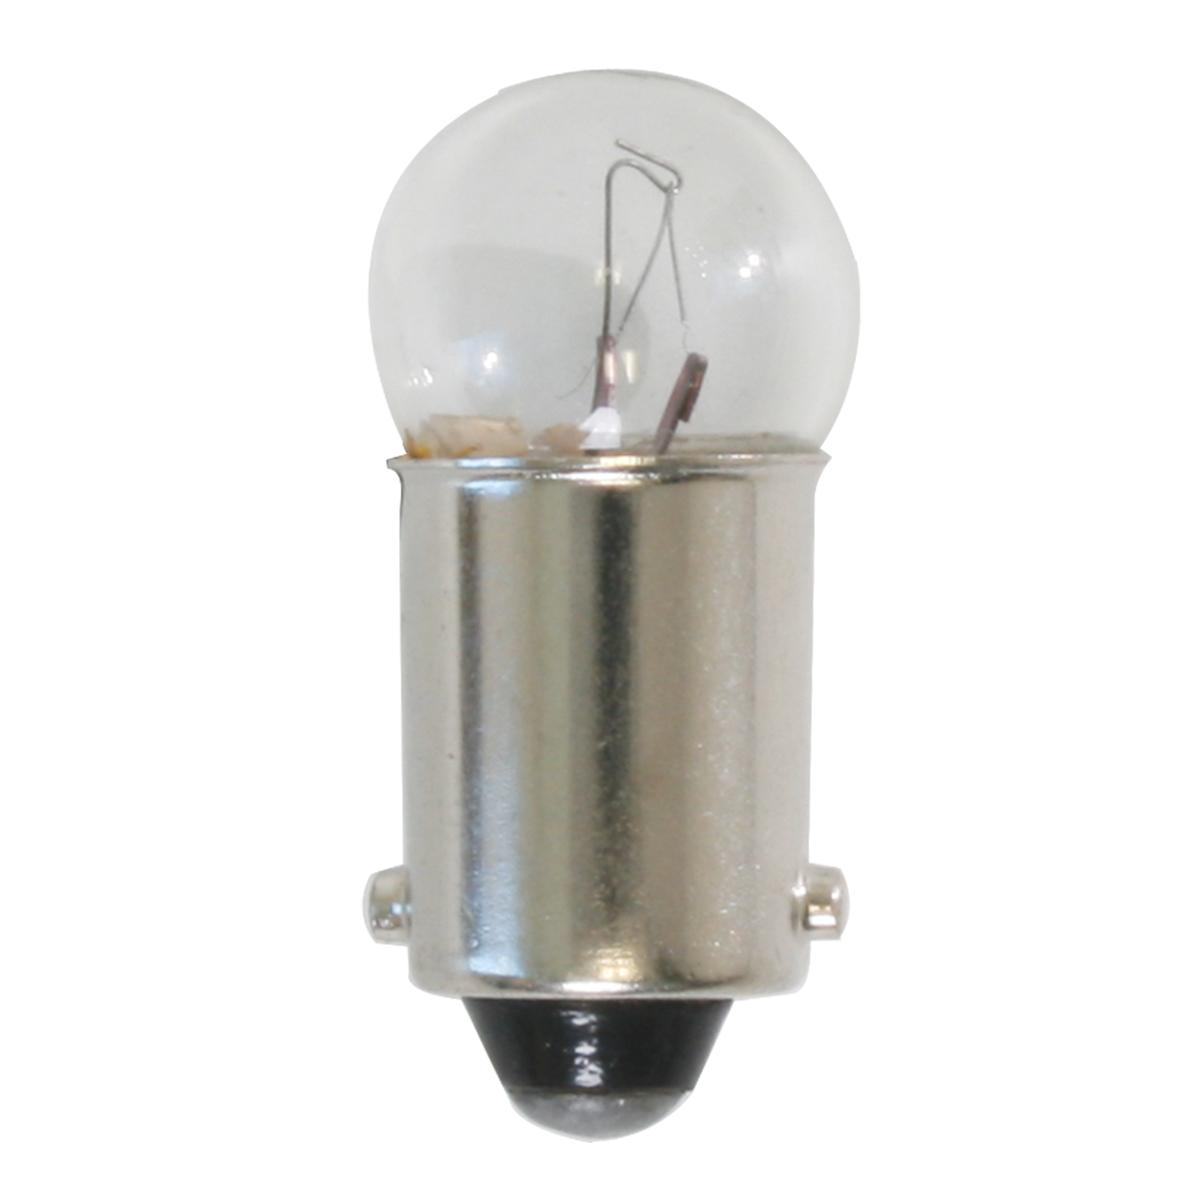 1445 Miniature Replacement Light Bulbs Grand General